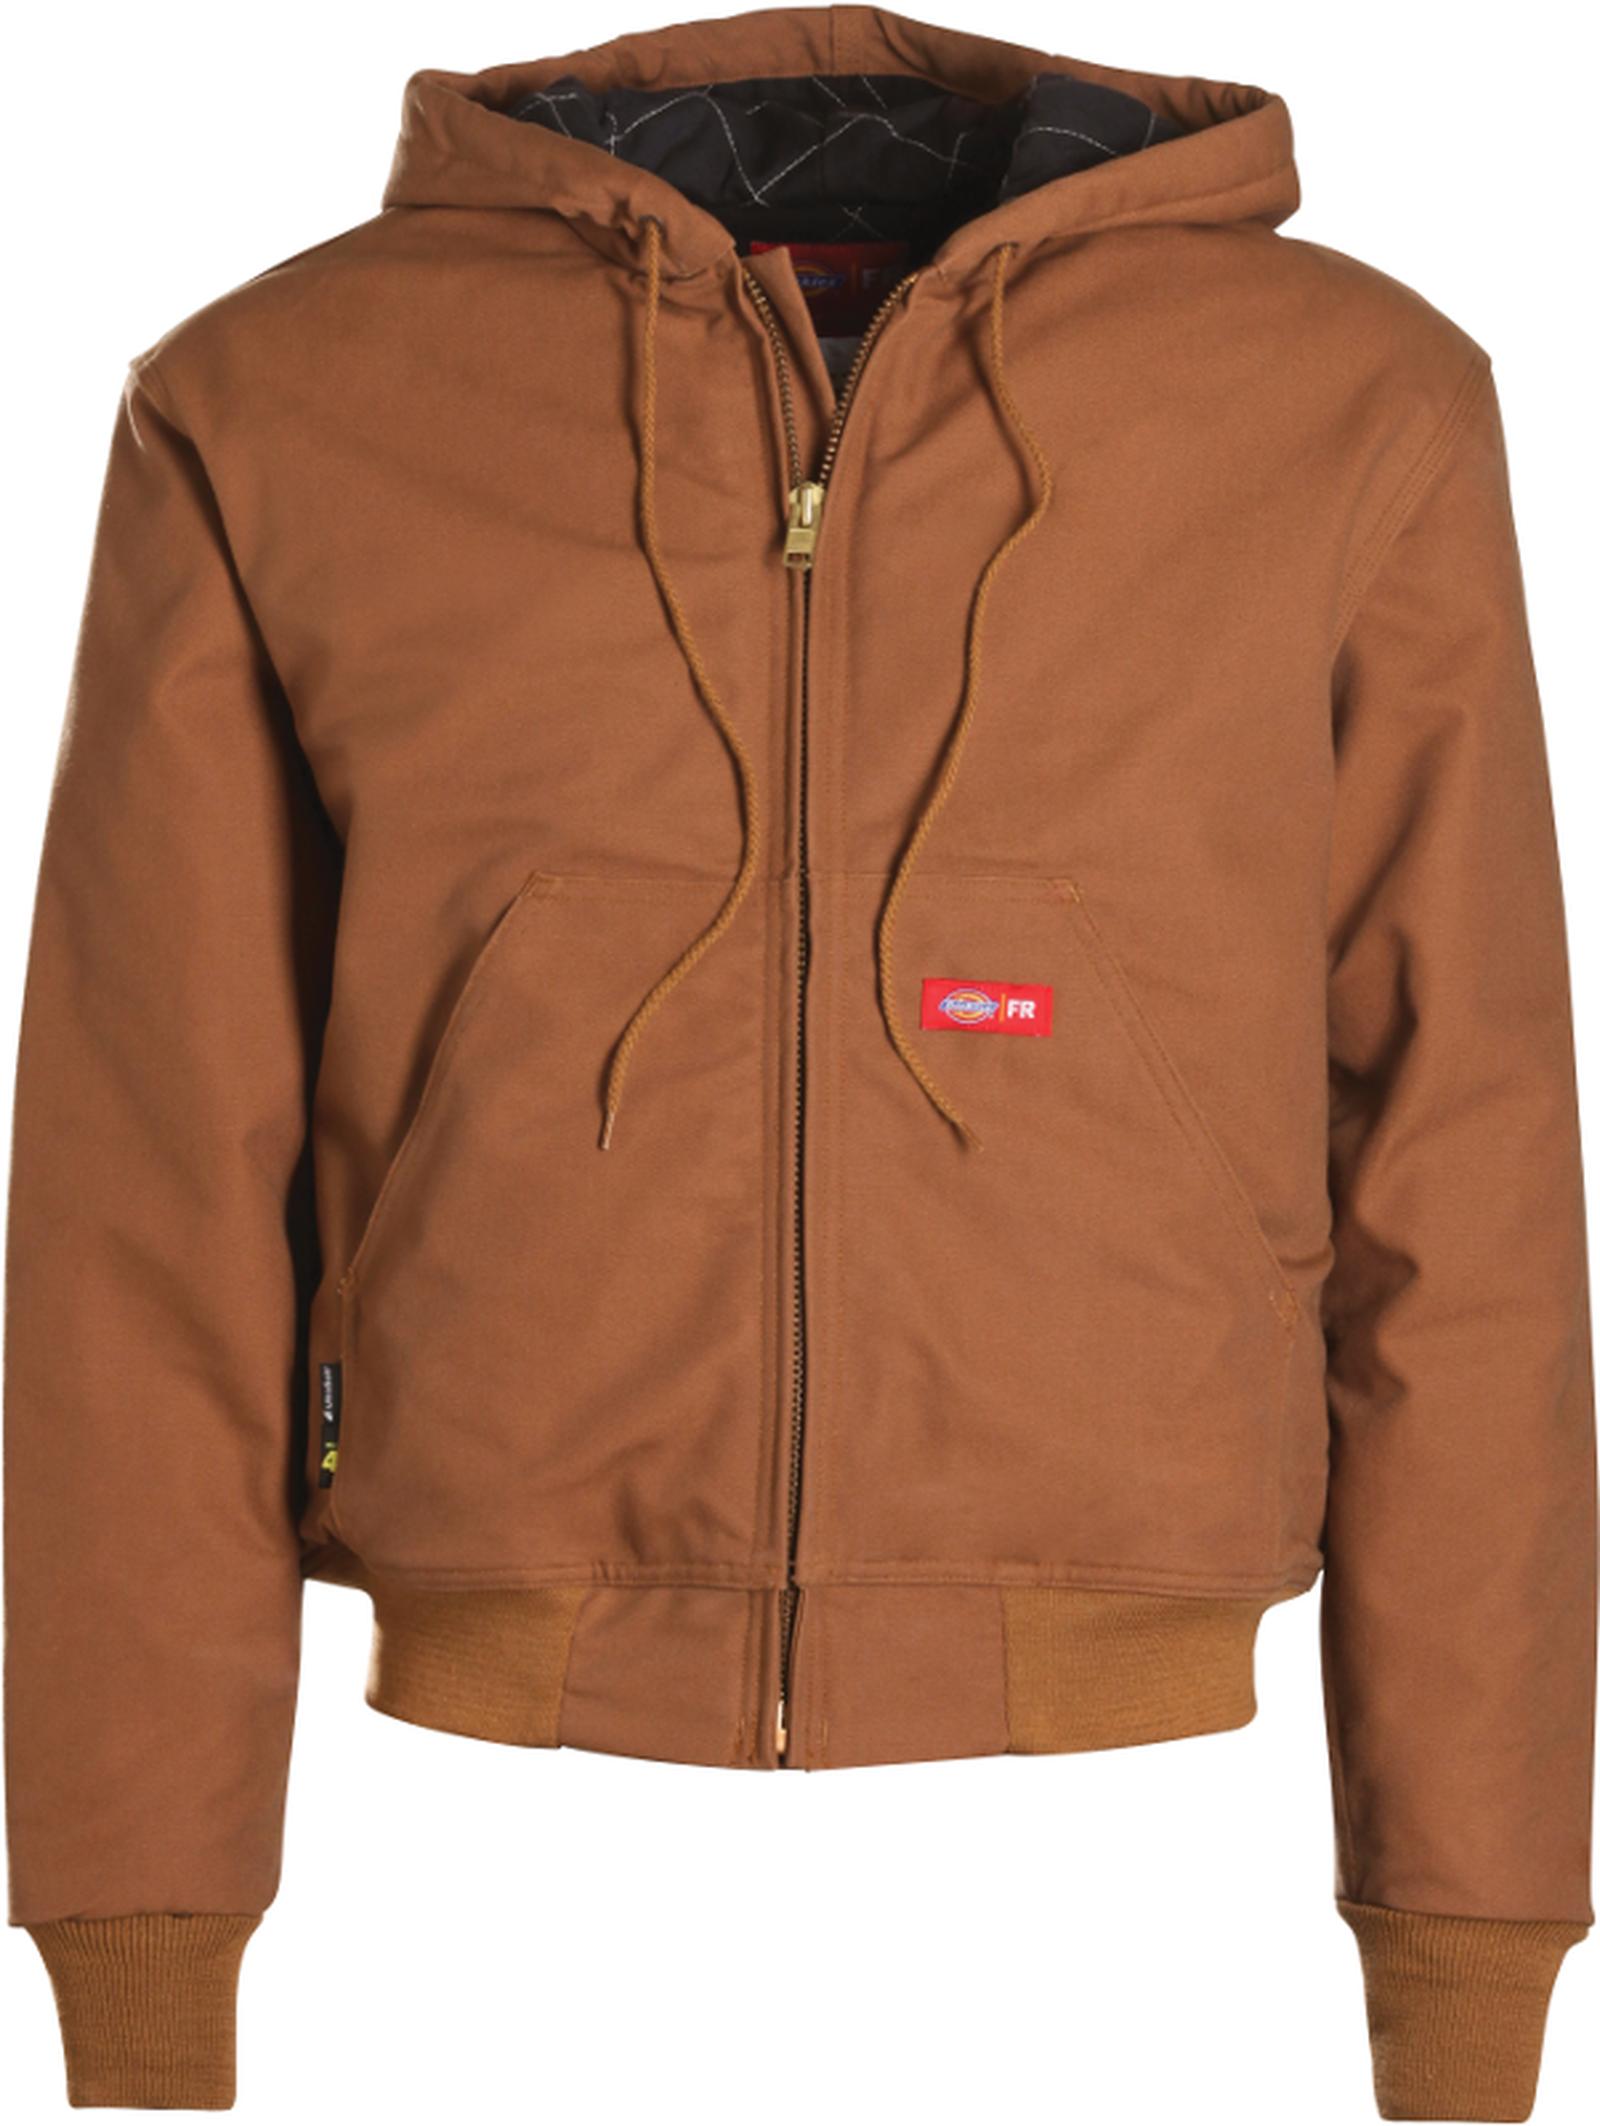 Heavyweight Hooded Jacket